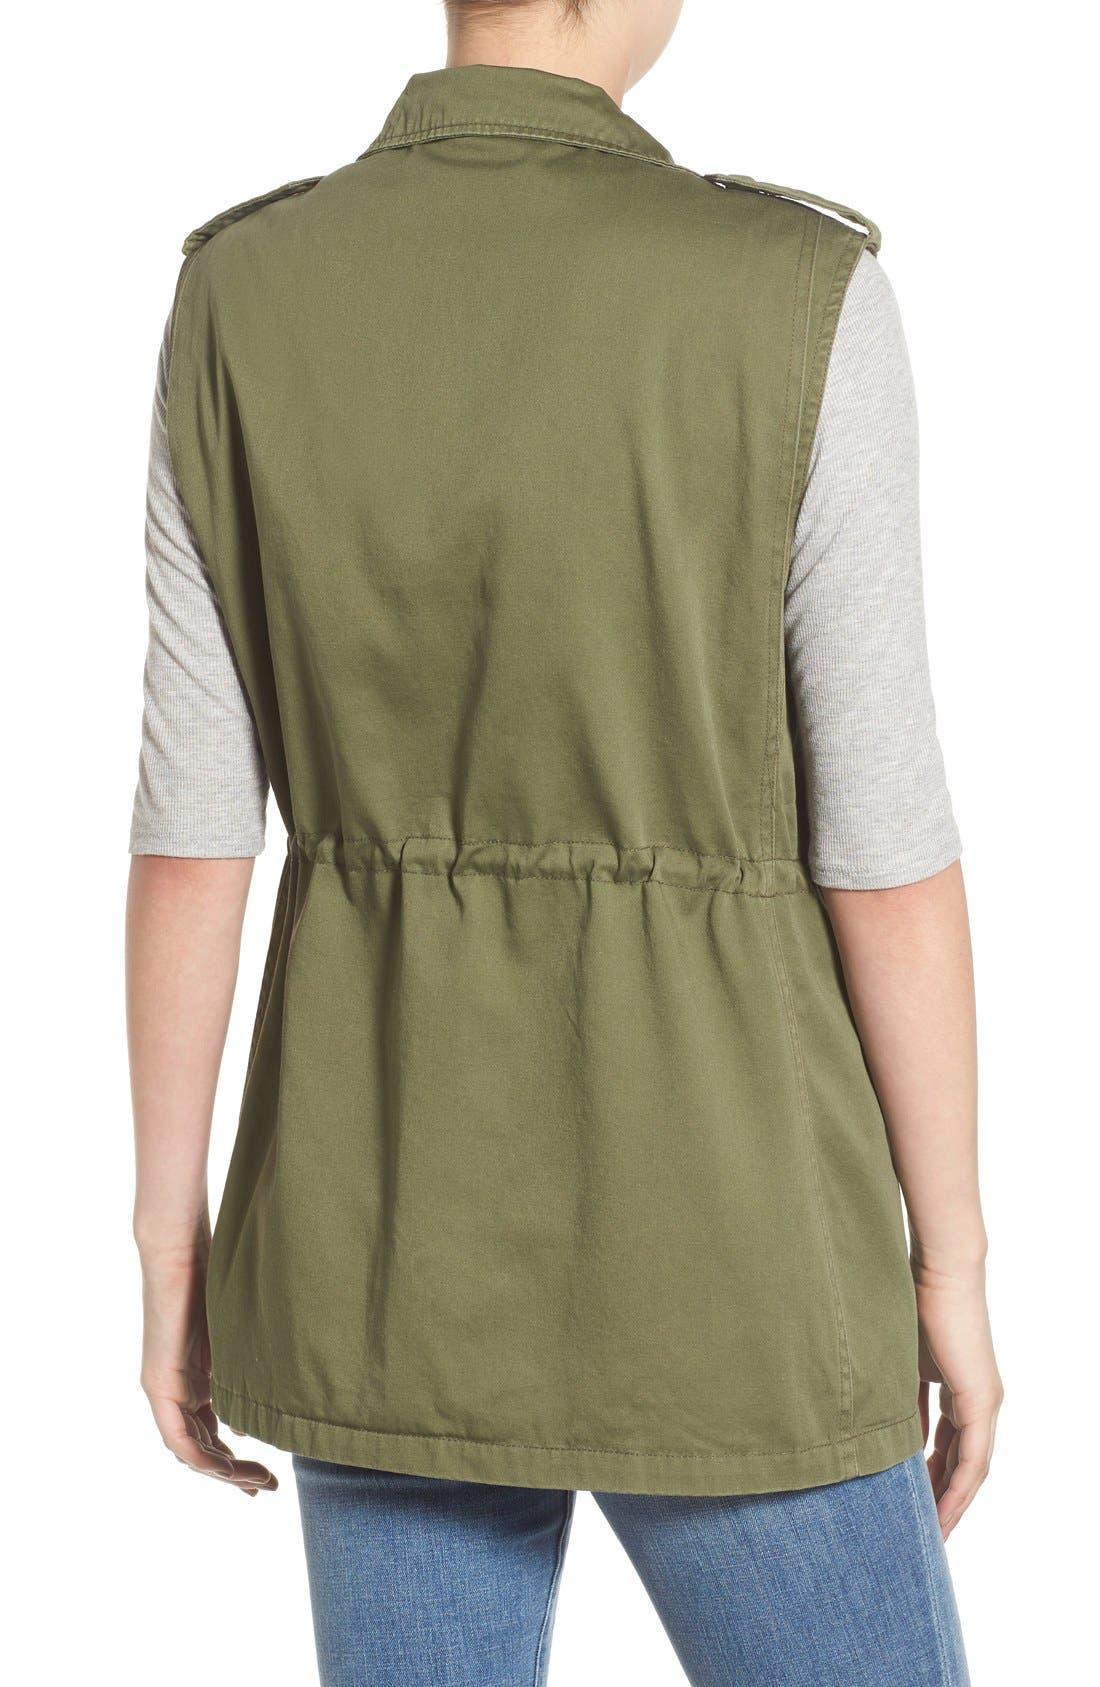 Alternate Image 3  - Thread & Supply Utility Vest